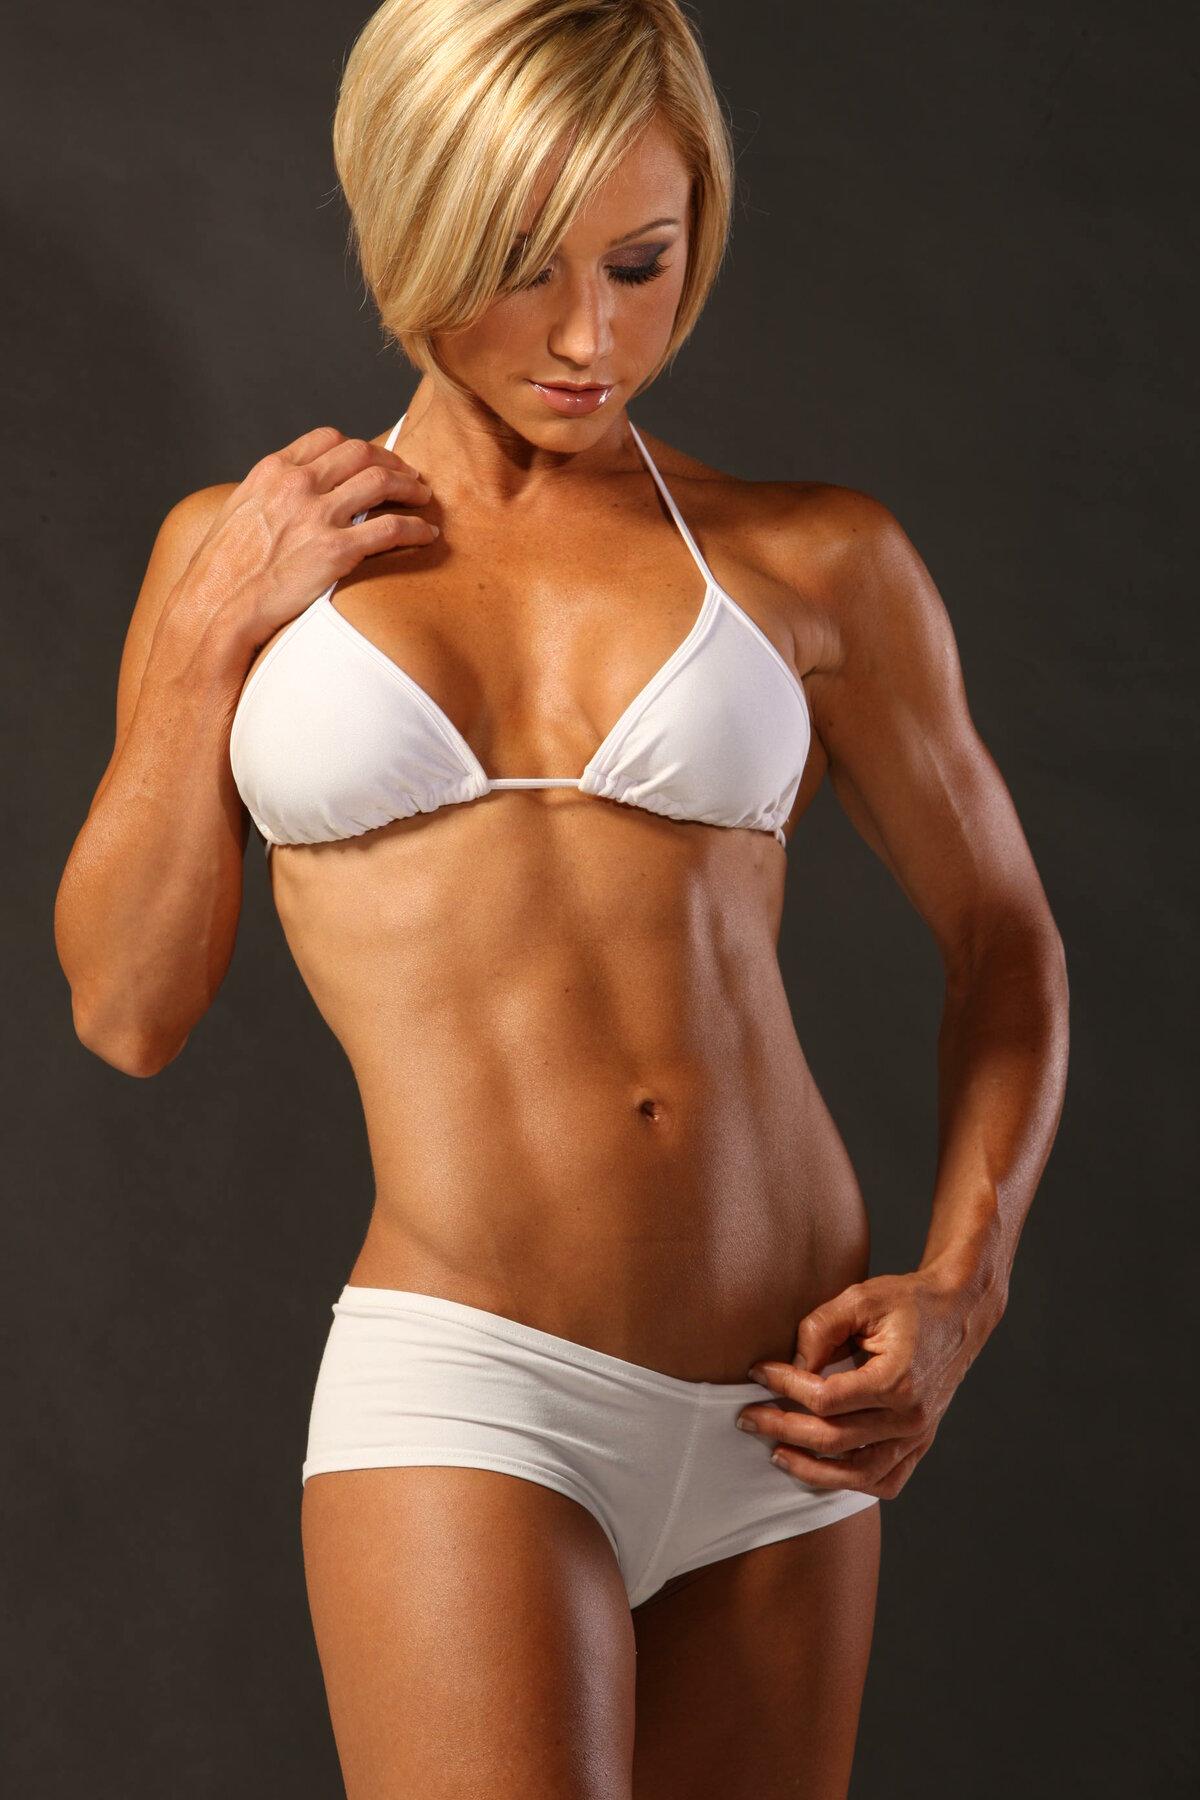 Hot nude female fitness models — 13